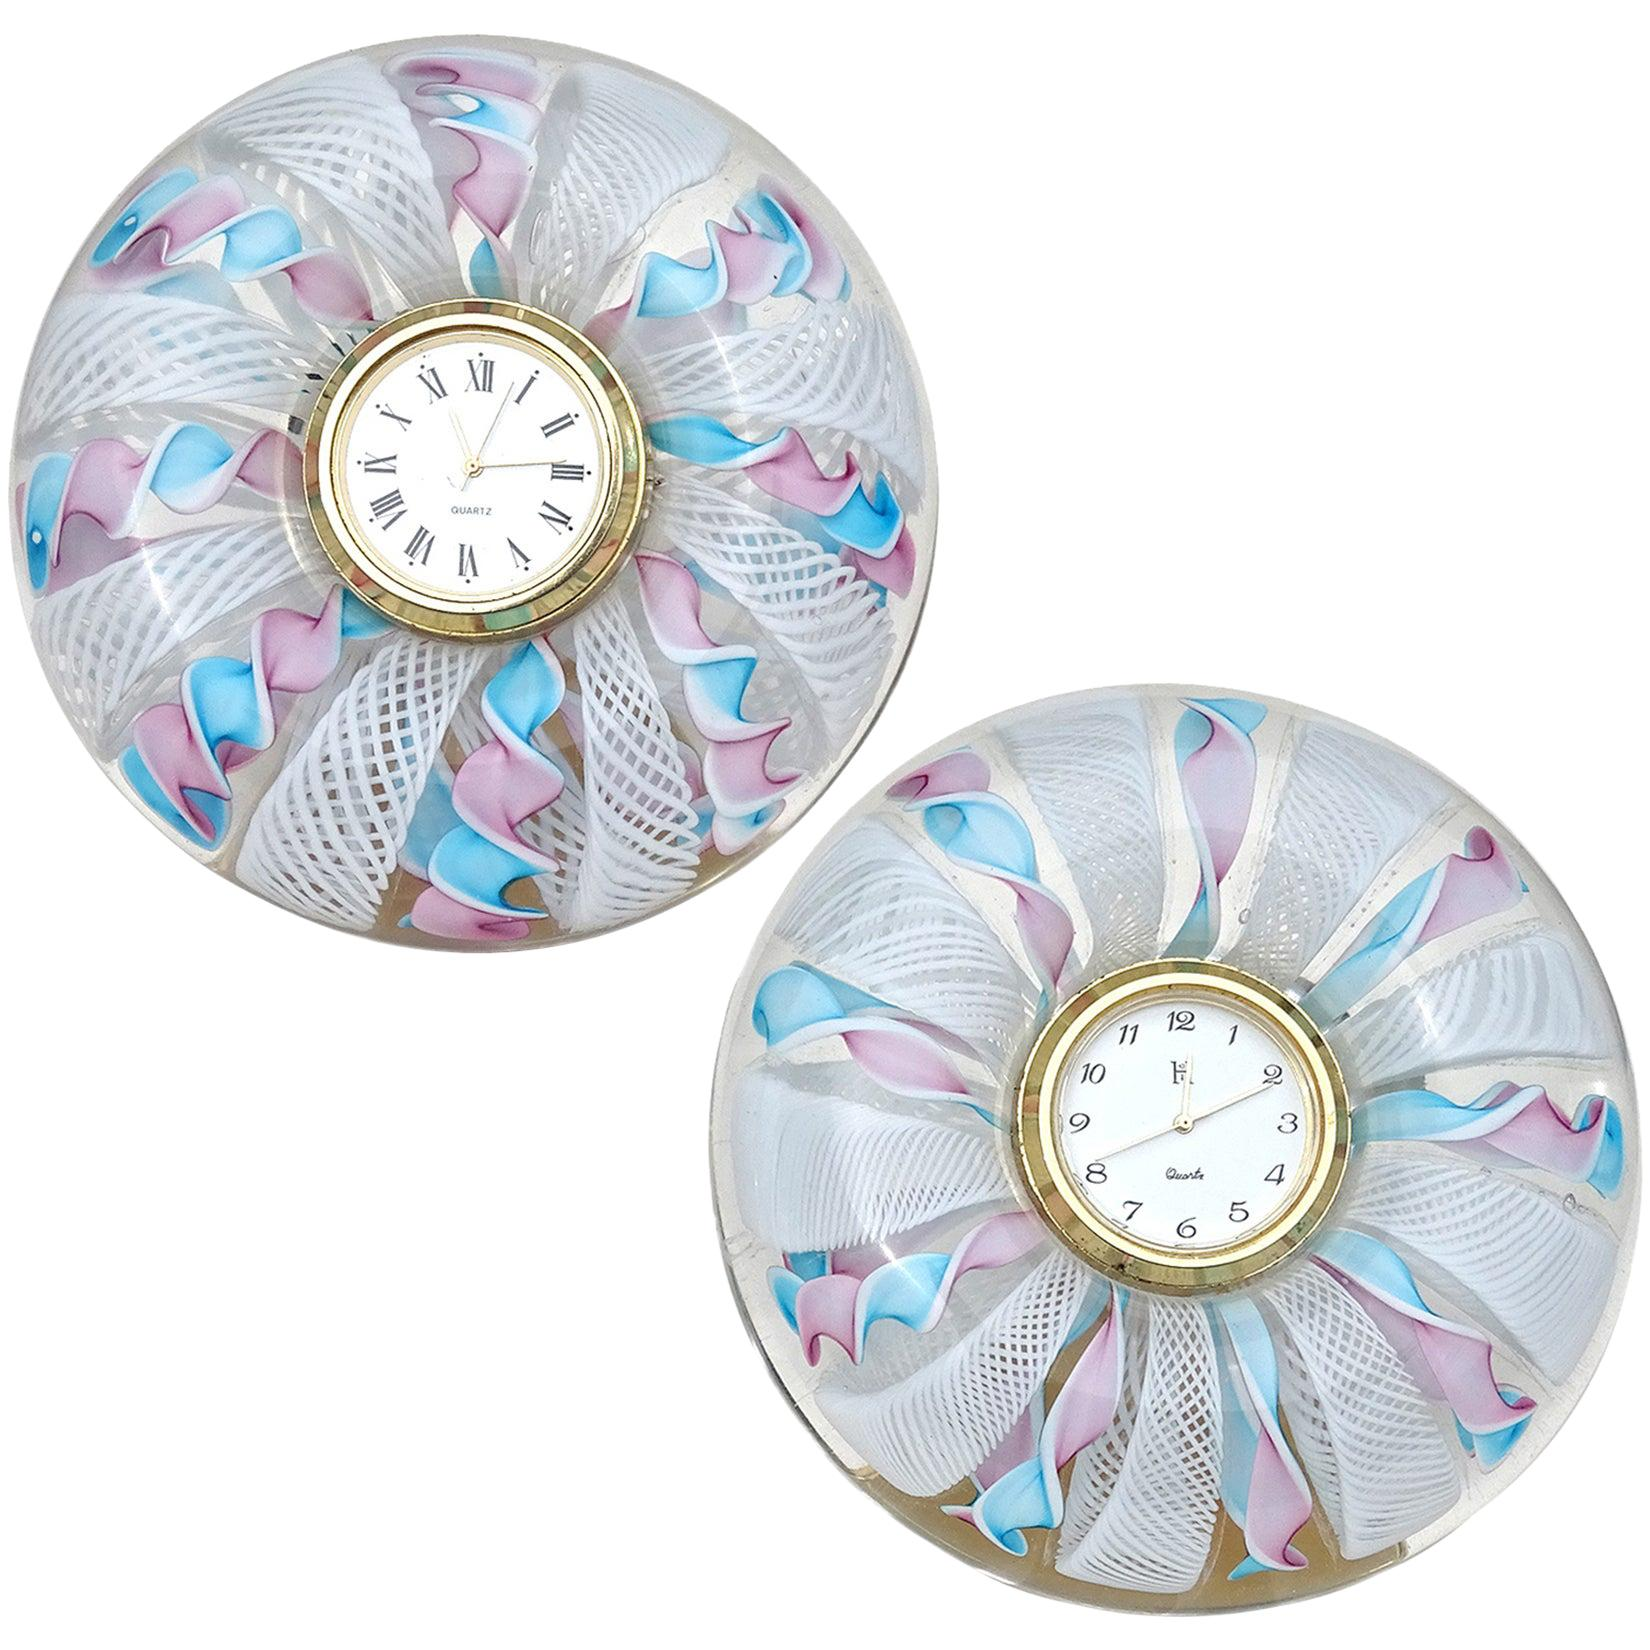 Murano Blue Pink White Ribbons Italian Art Glass Decorative Round Desk Clock